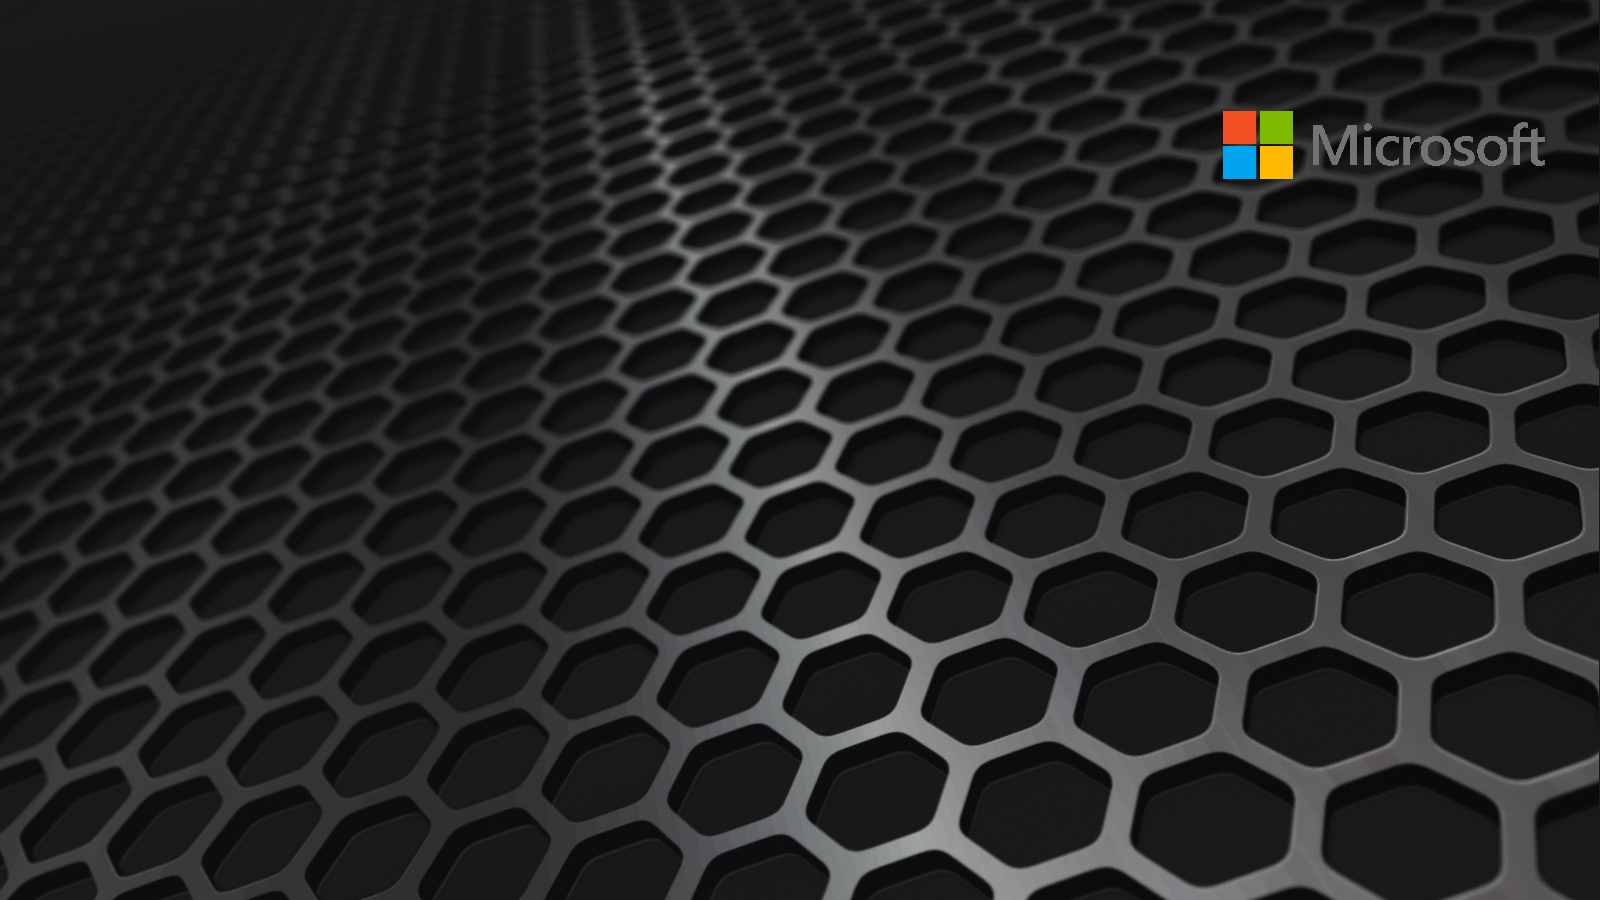 Microsoft Wallpaper 06